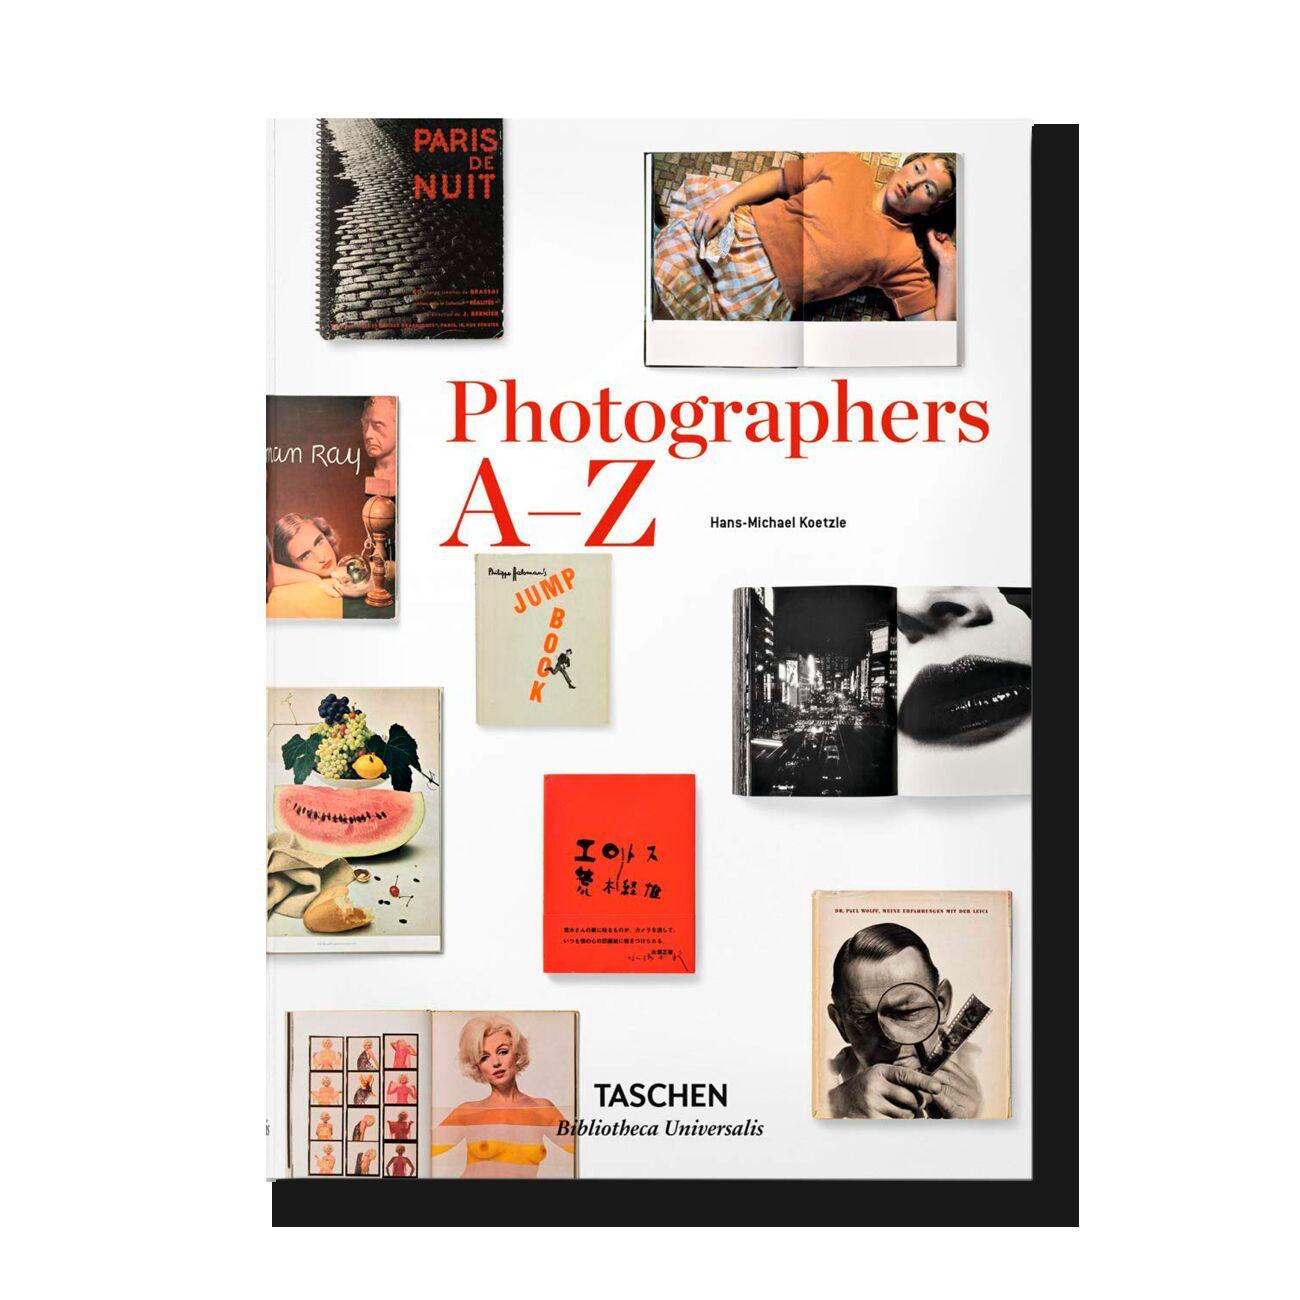 Photographers A-Z (Bibliotheca Universalis)